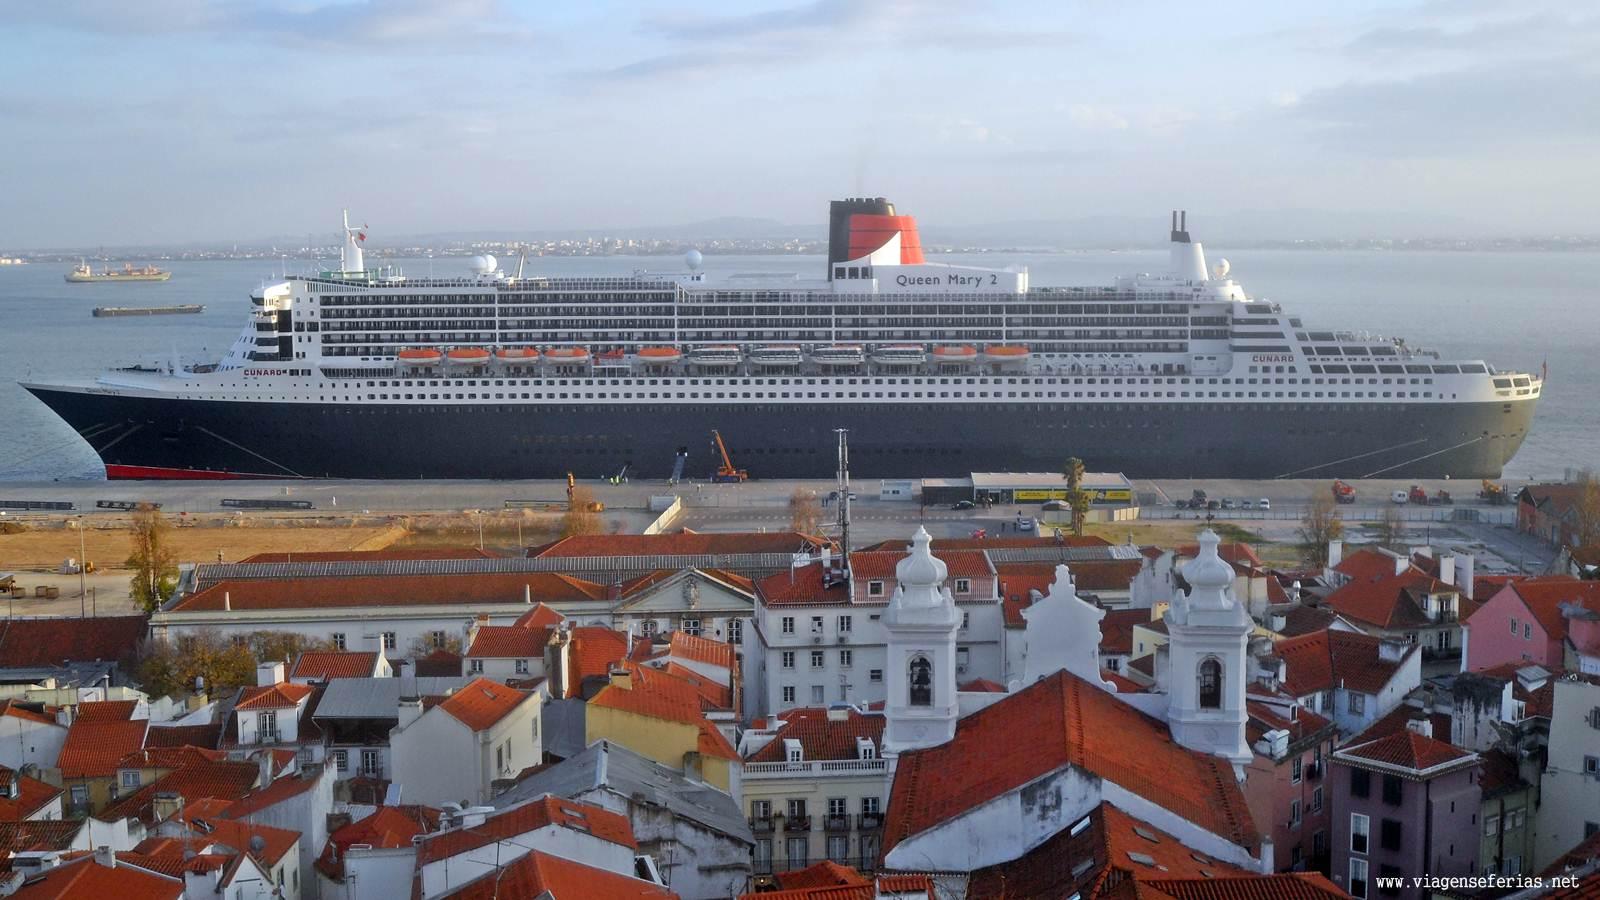 Navio de cruzeiro Queen Mary 2 da Cunard atracado no porto de Lisboa